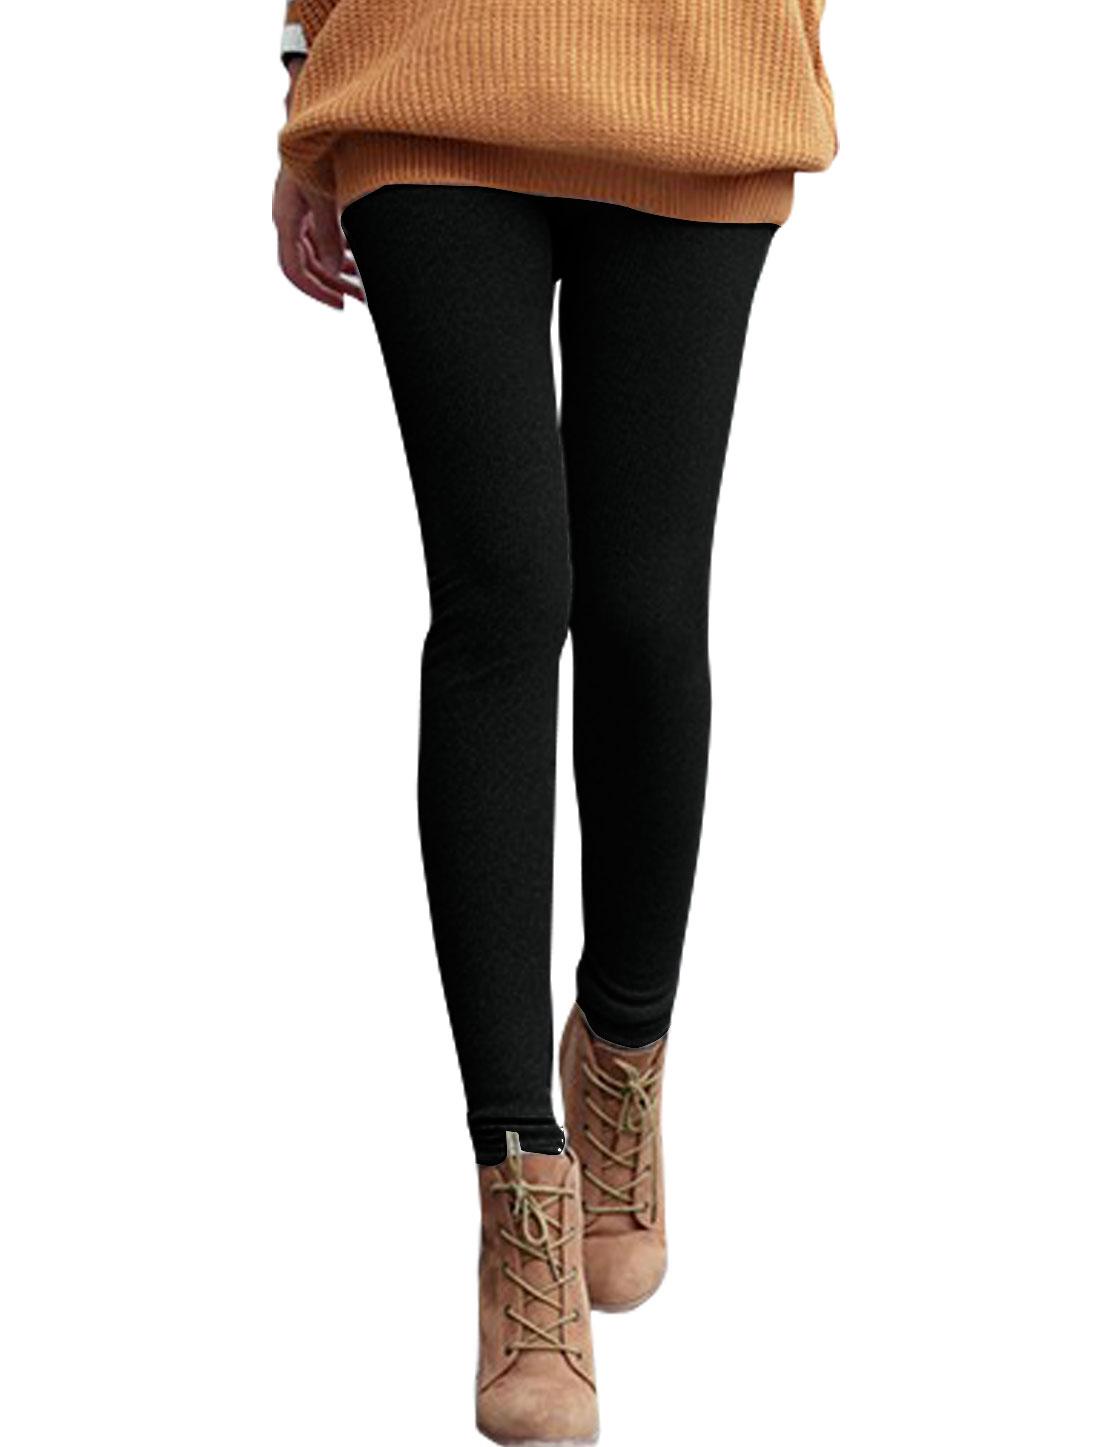 Women High Rise Soft Lined Skinny Ribbed Leggings Black XS